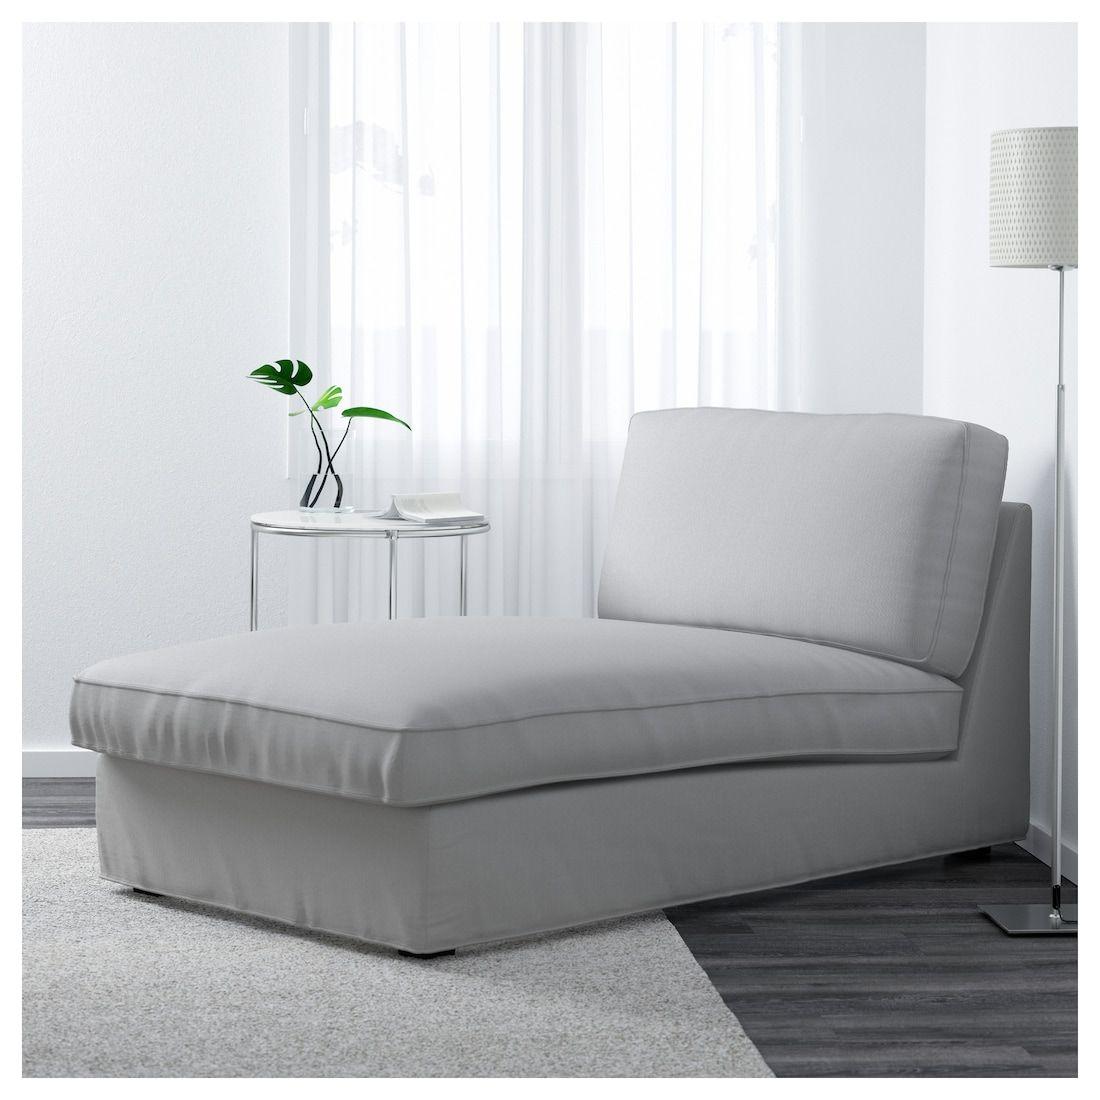 KIVIK Chaise Orrsta light gray Chaise, Ikea kivik